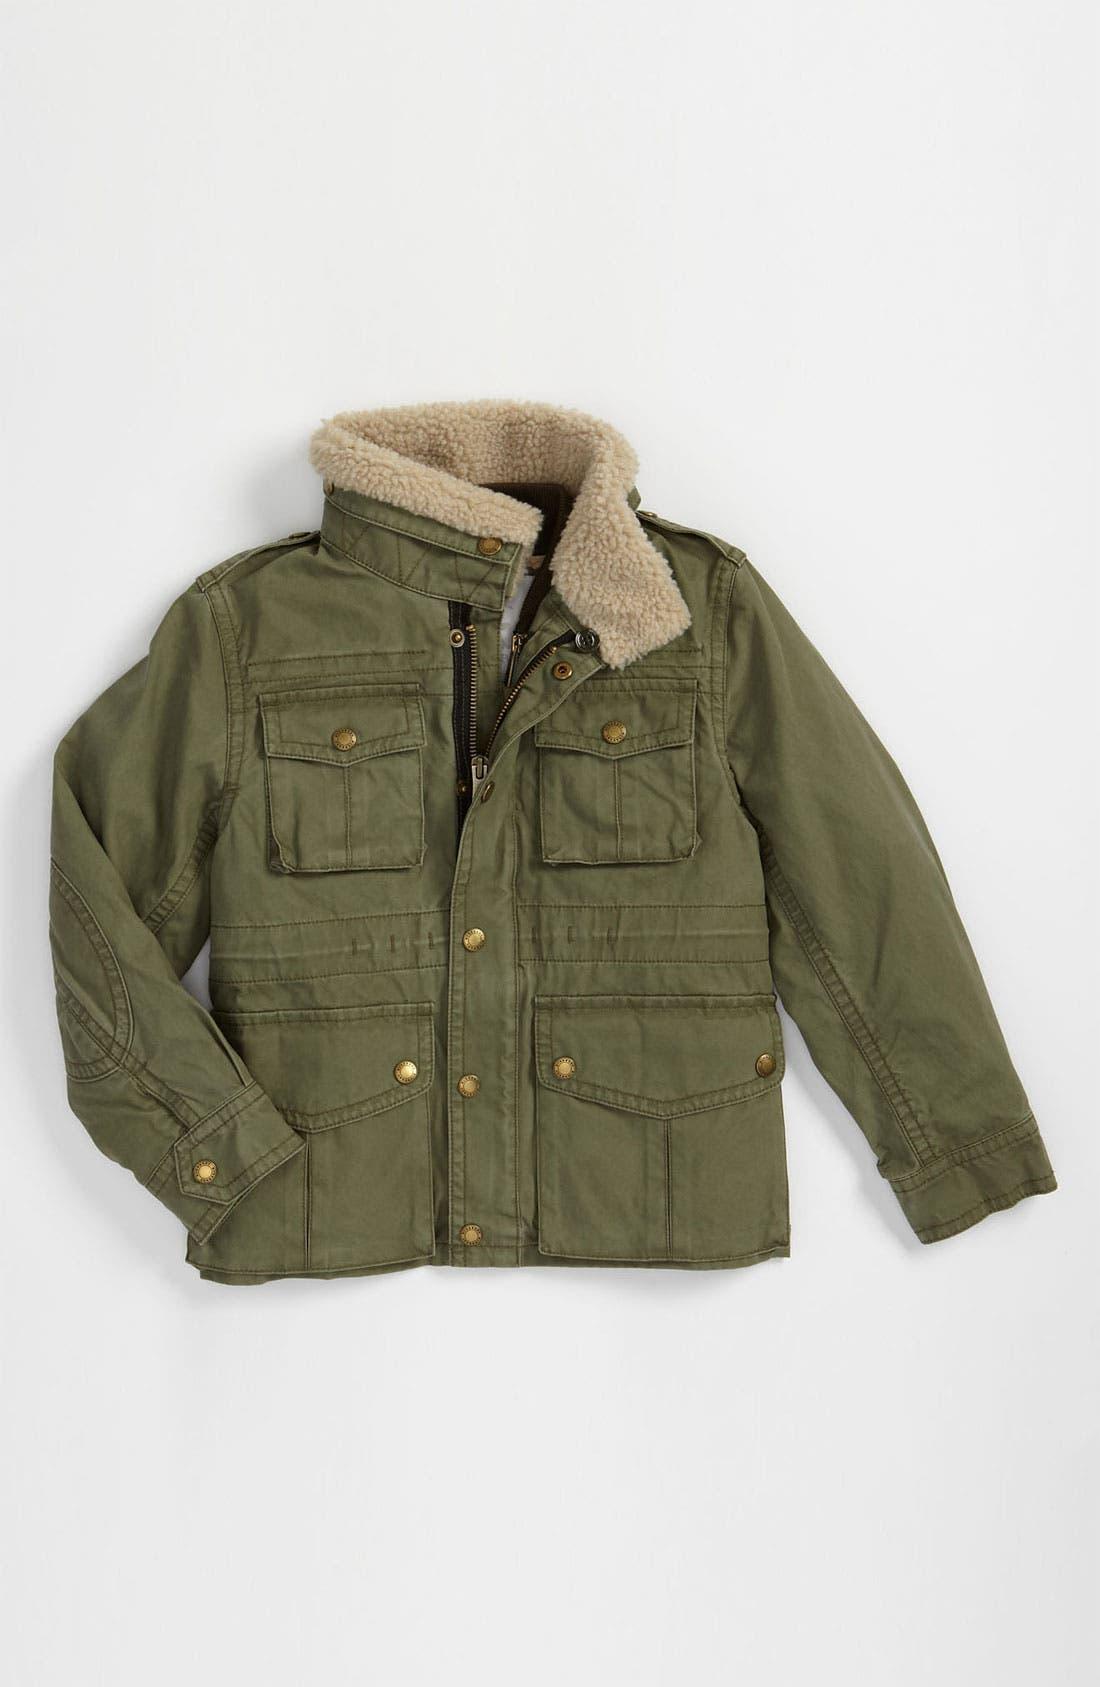 Alternate Image 1 Selected - Burberry Layered Jacket (Little Boys)